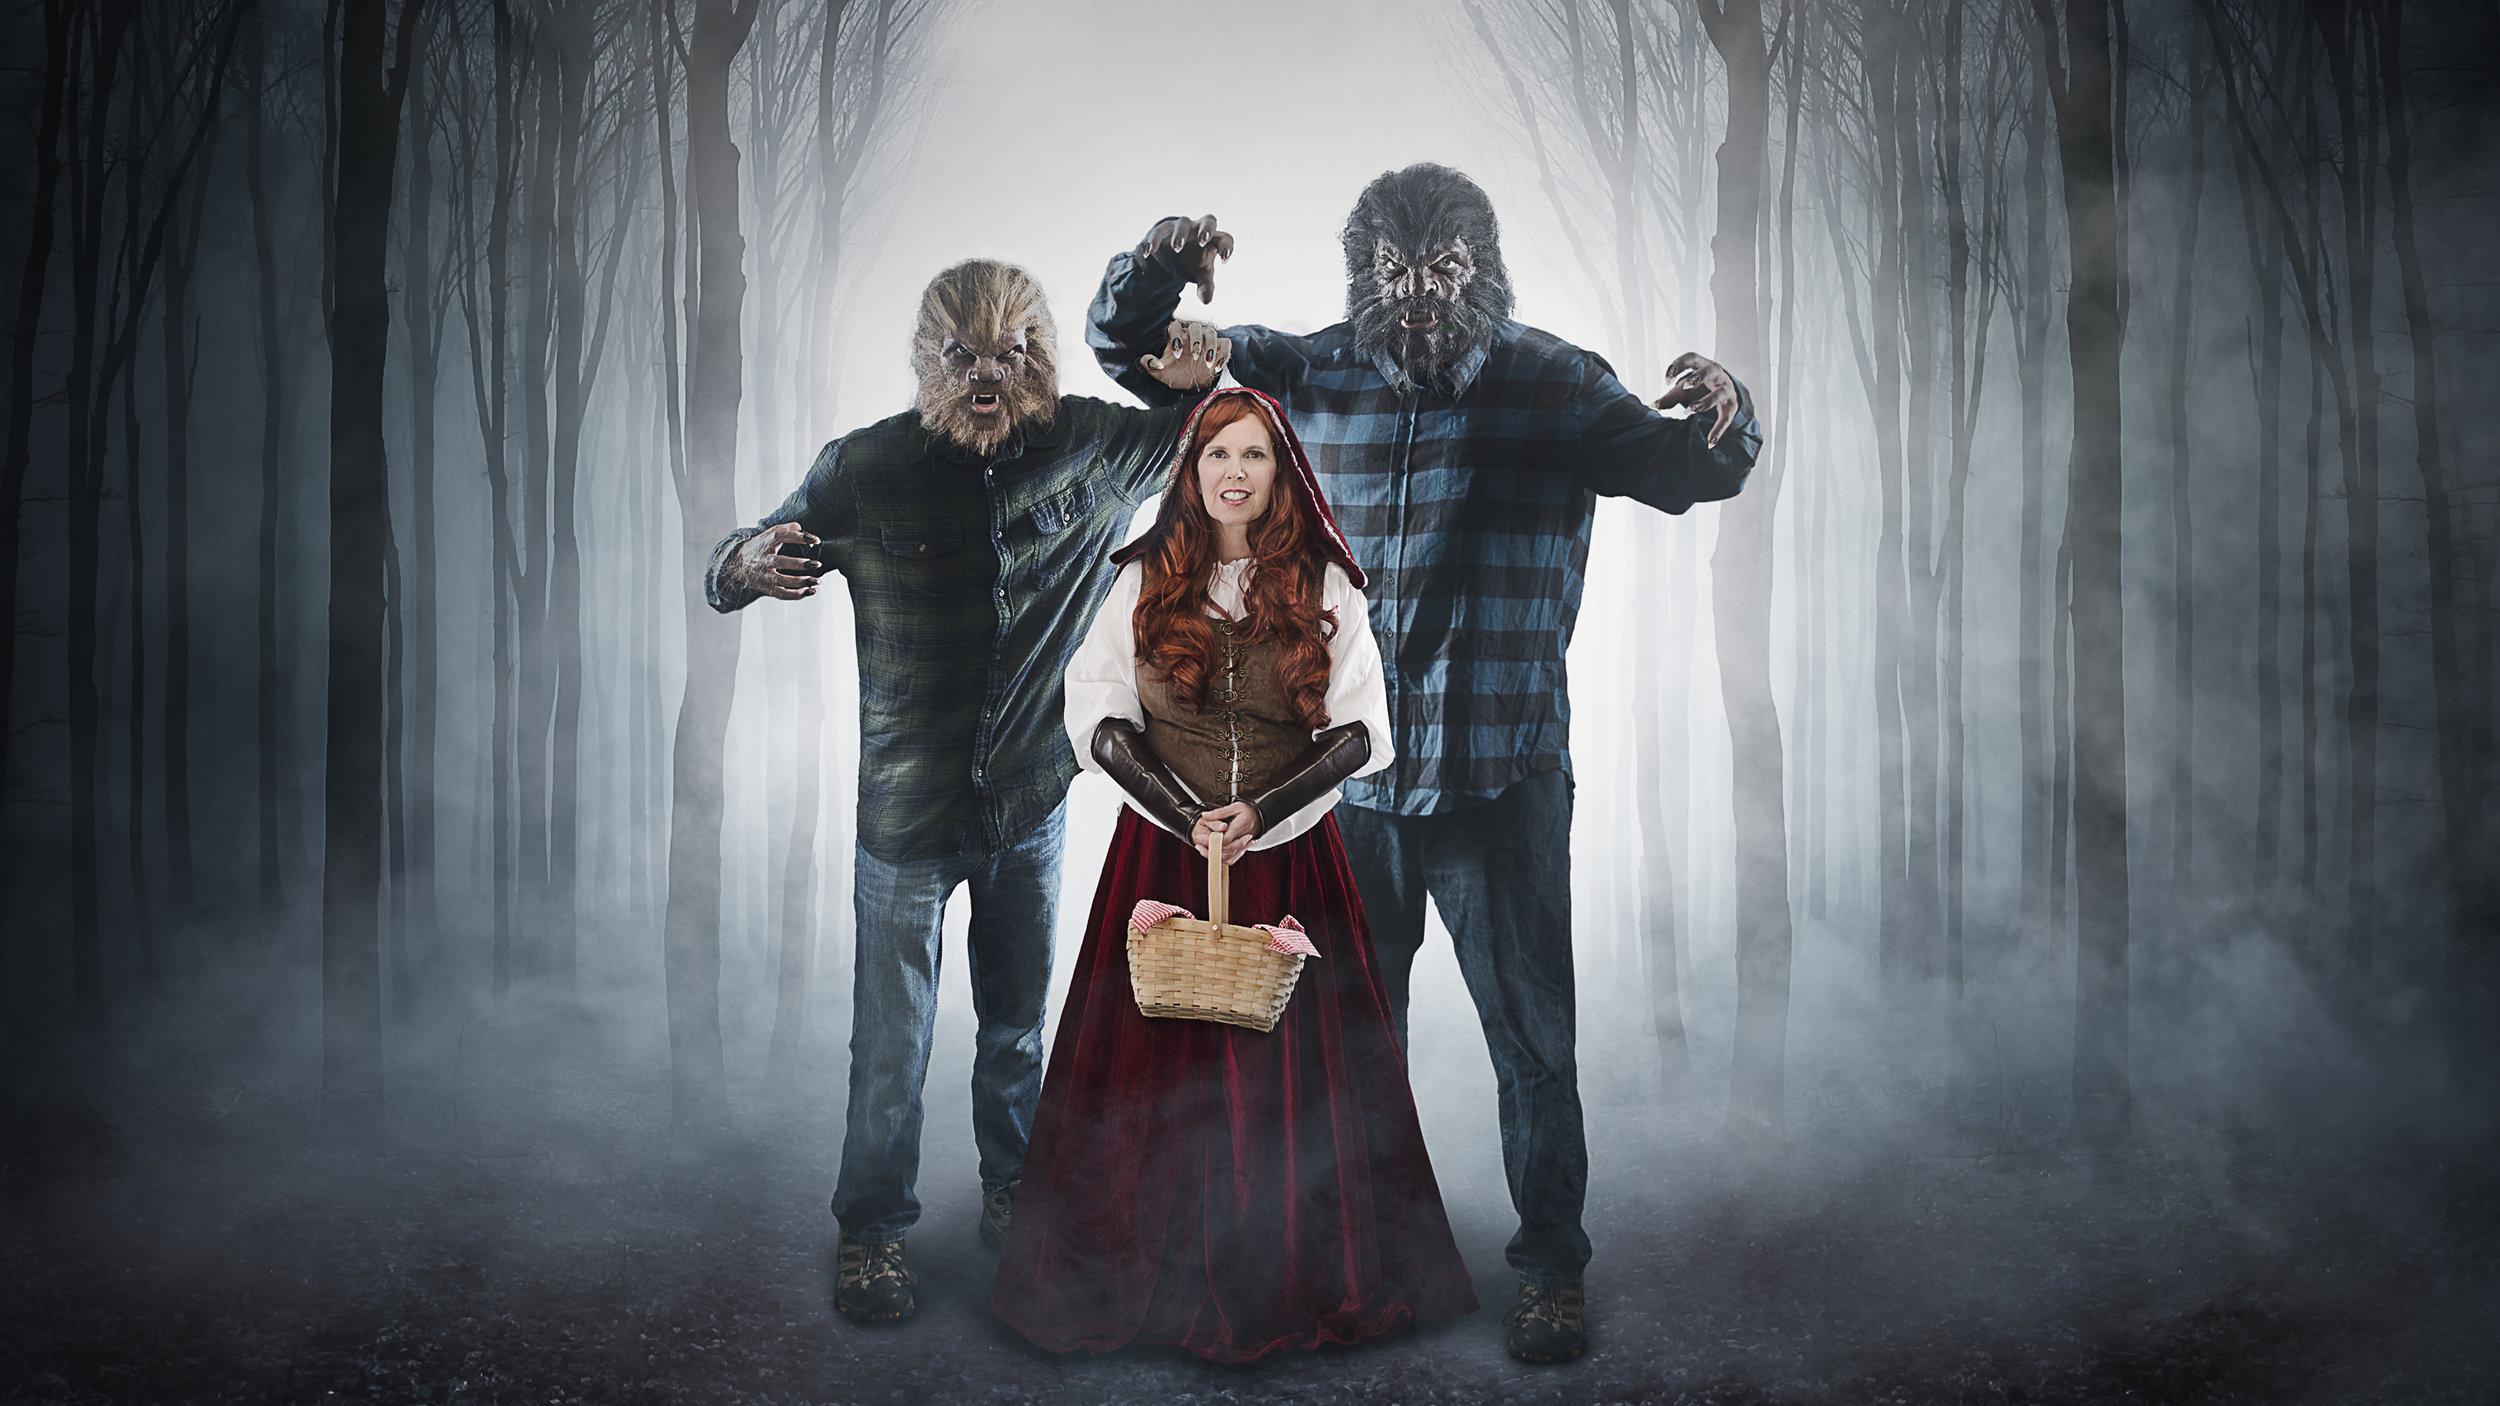 Halloween Family Portrait 2017 - Red Riding Hood Theme